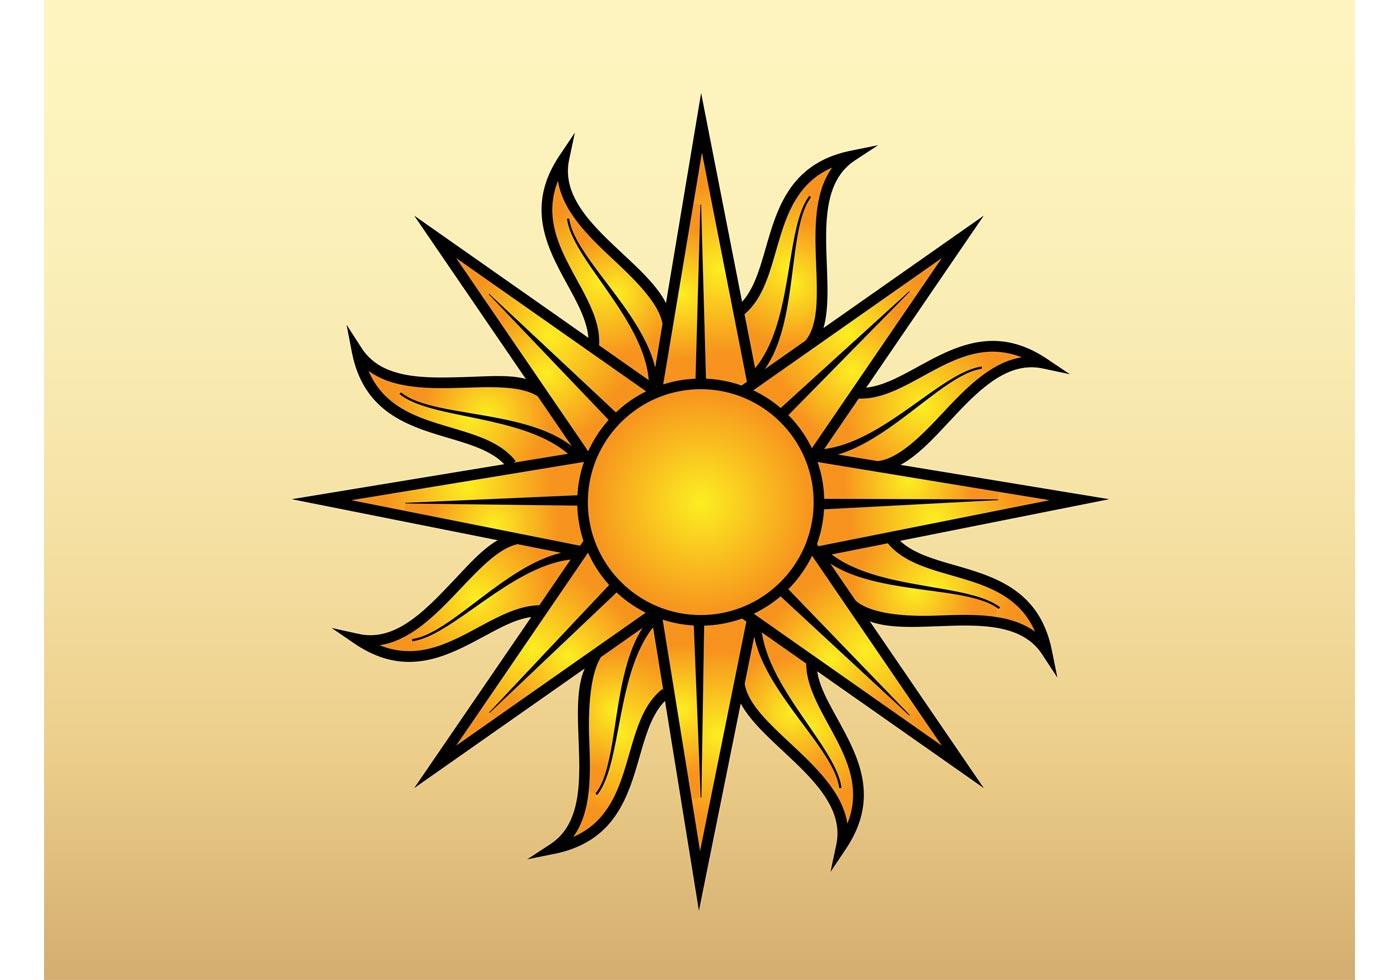 sun vector graphic download free vector art stock